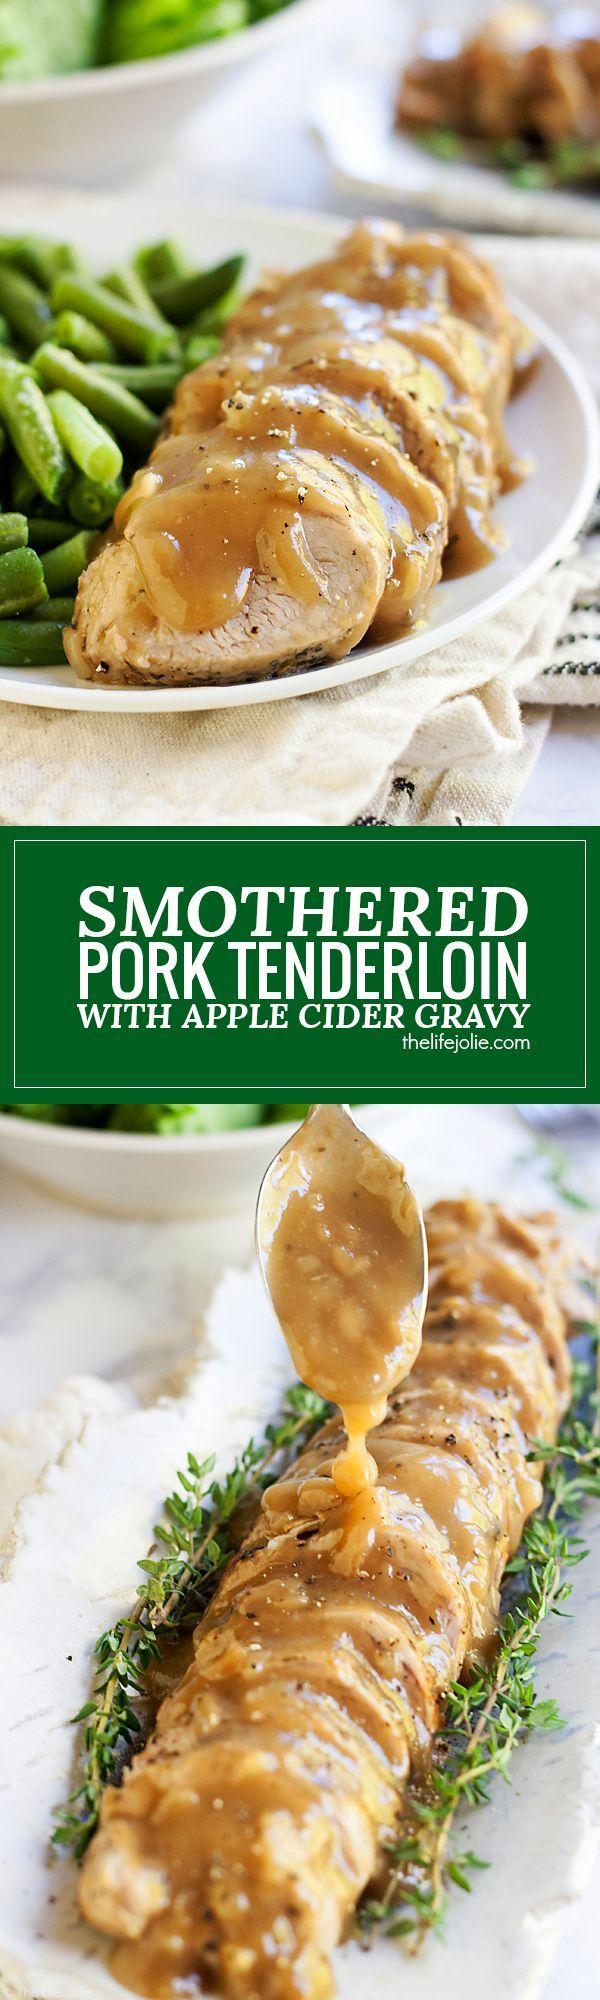 2017 05 potluck ideas for small groups - 30 Minute Pork Tenderloin In Apple Cider Gravy